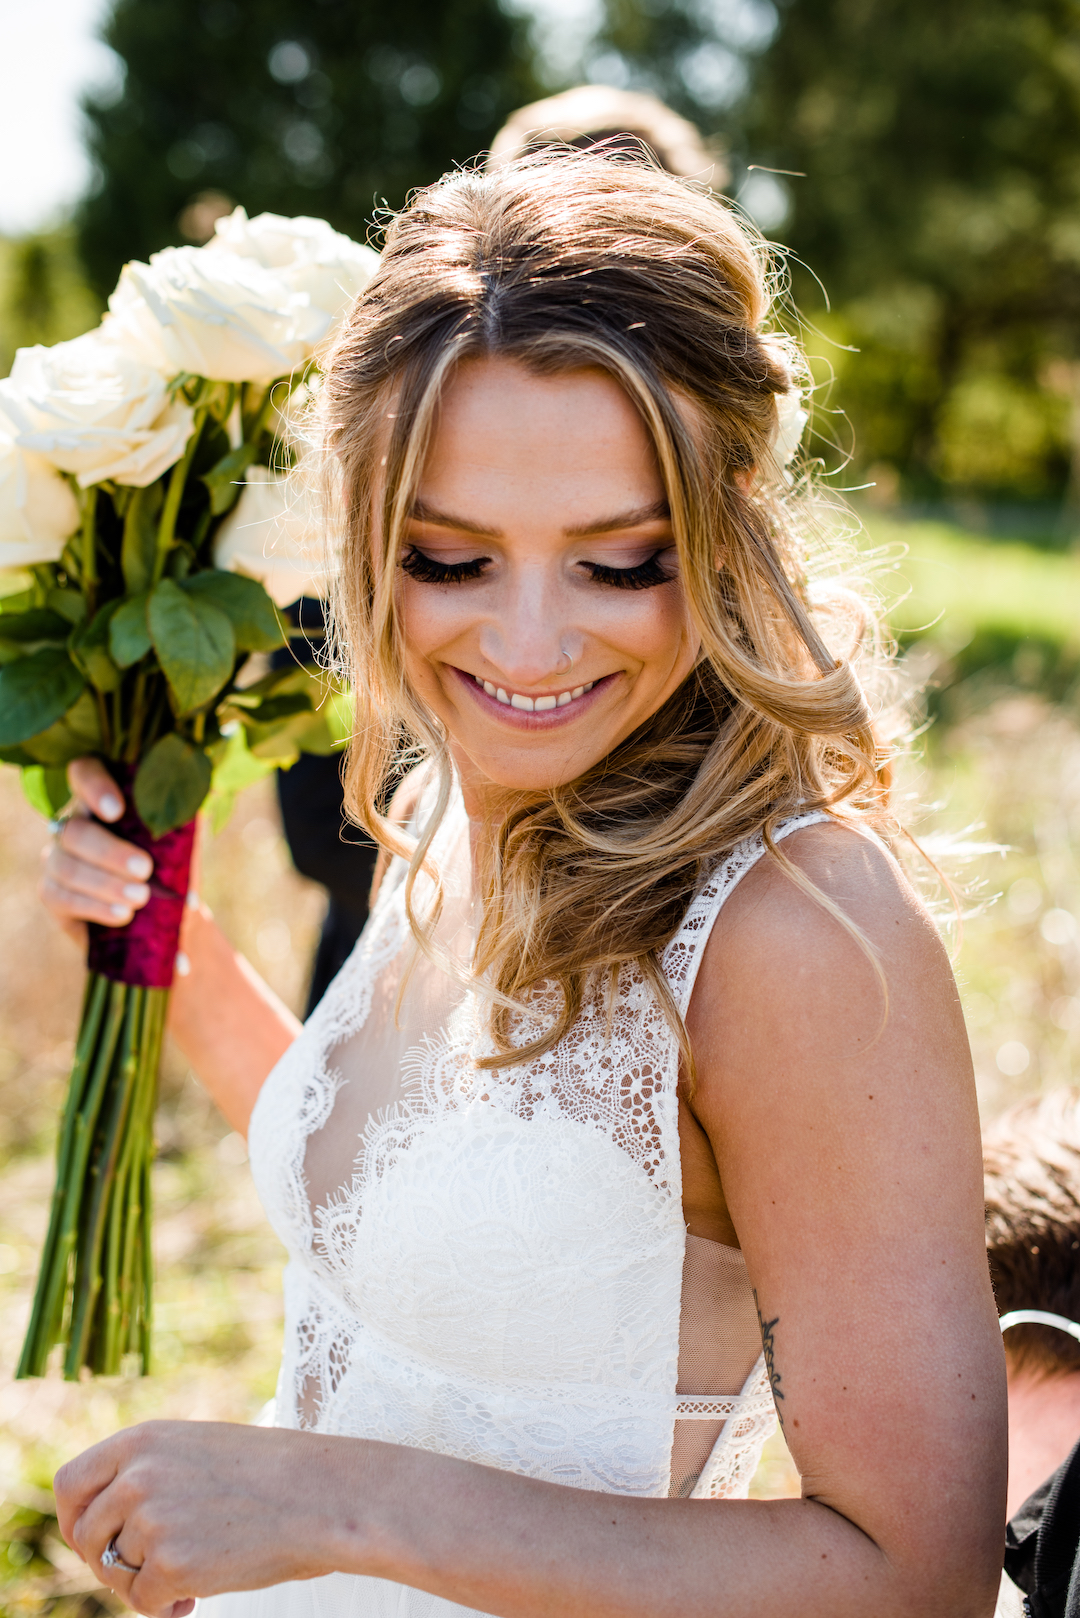 Tennessee Wedding Photographer Kathy Thomas Photography Bridal Portrait